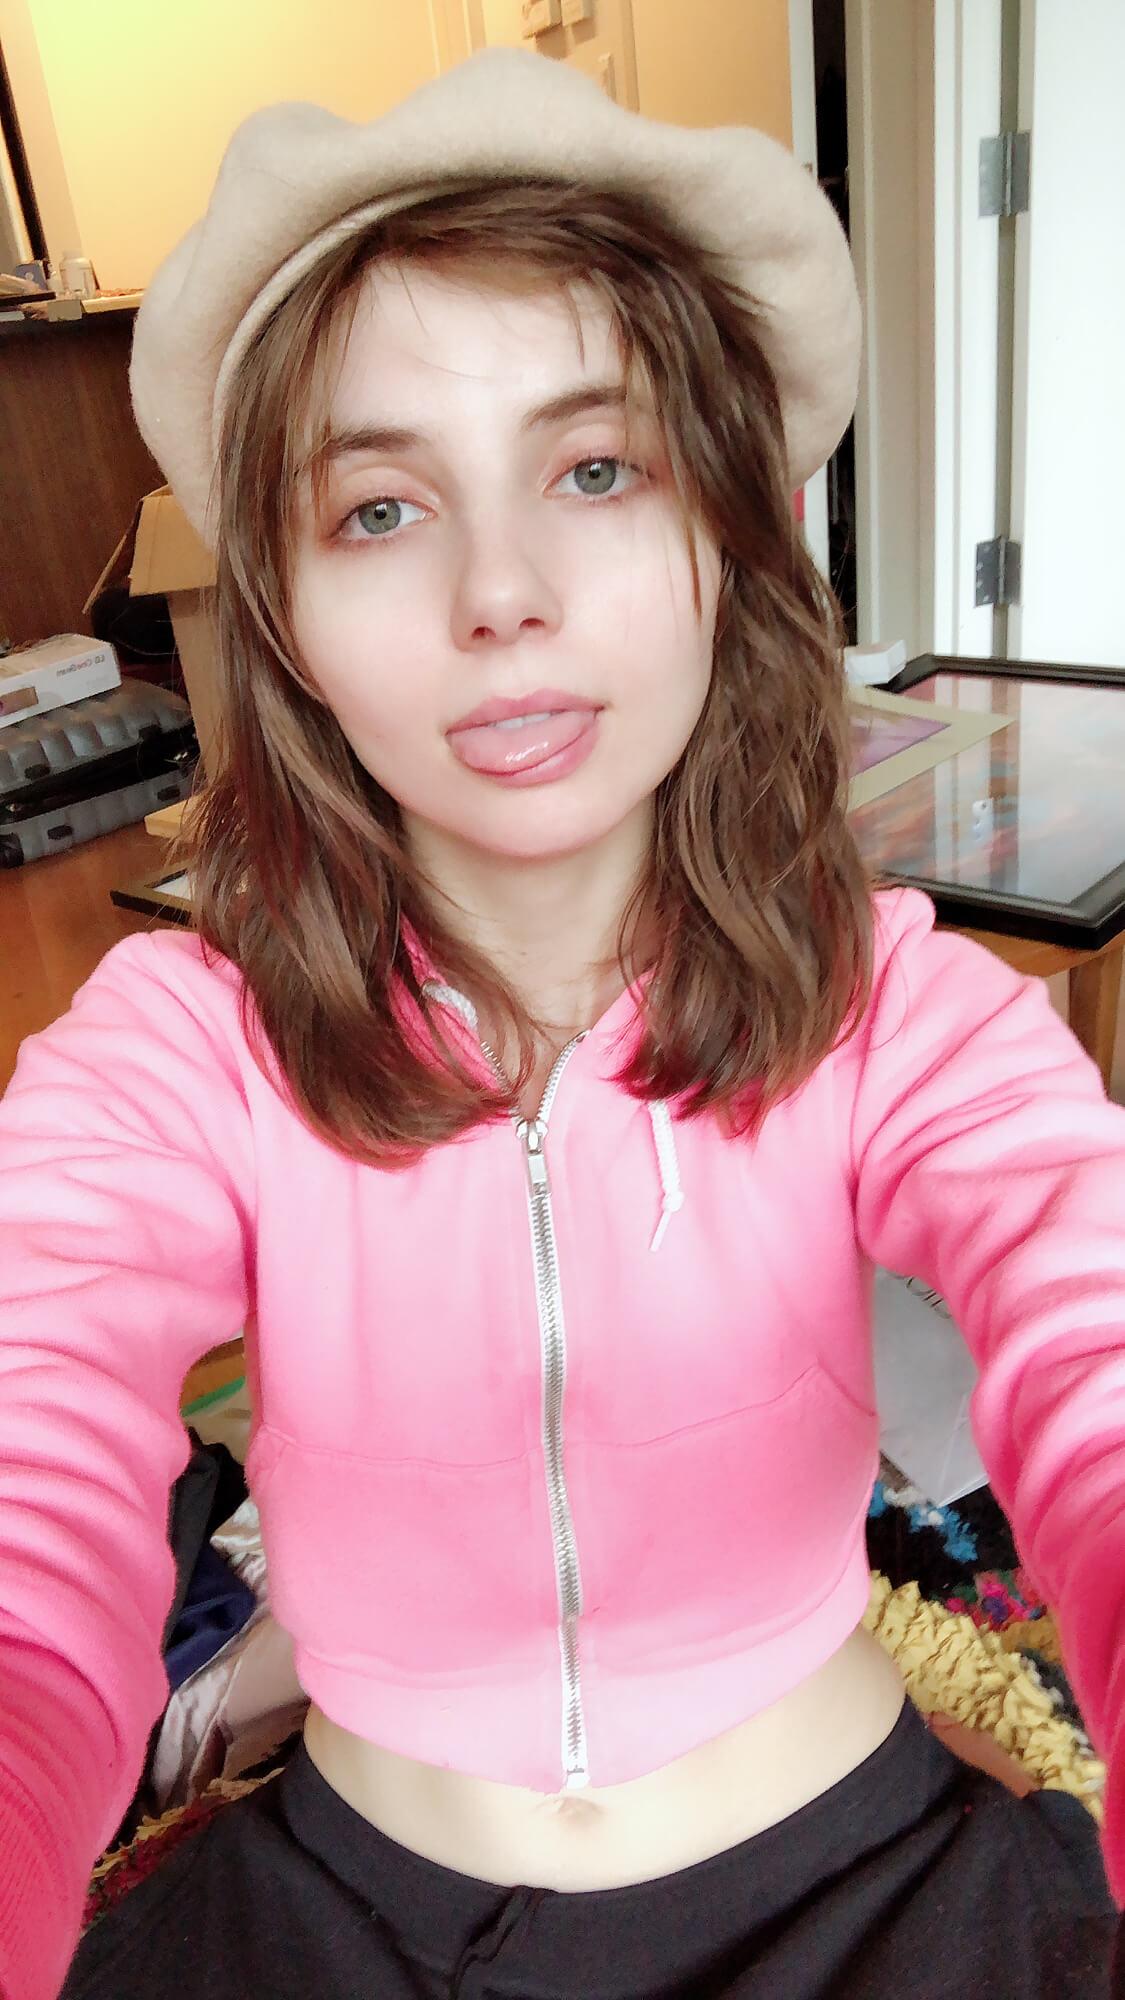 https://liararoux.xxx/wp-content/uploads/2018/10/Liara-Roux-Selfies-and-Snapshots-September-2018-021.jpg